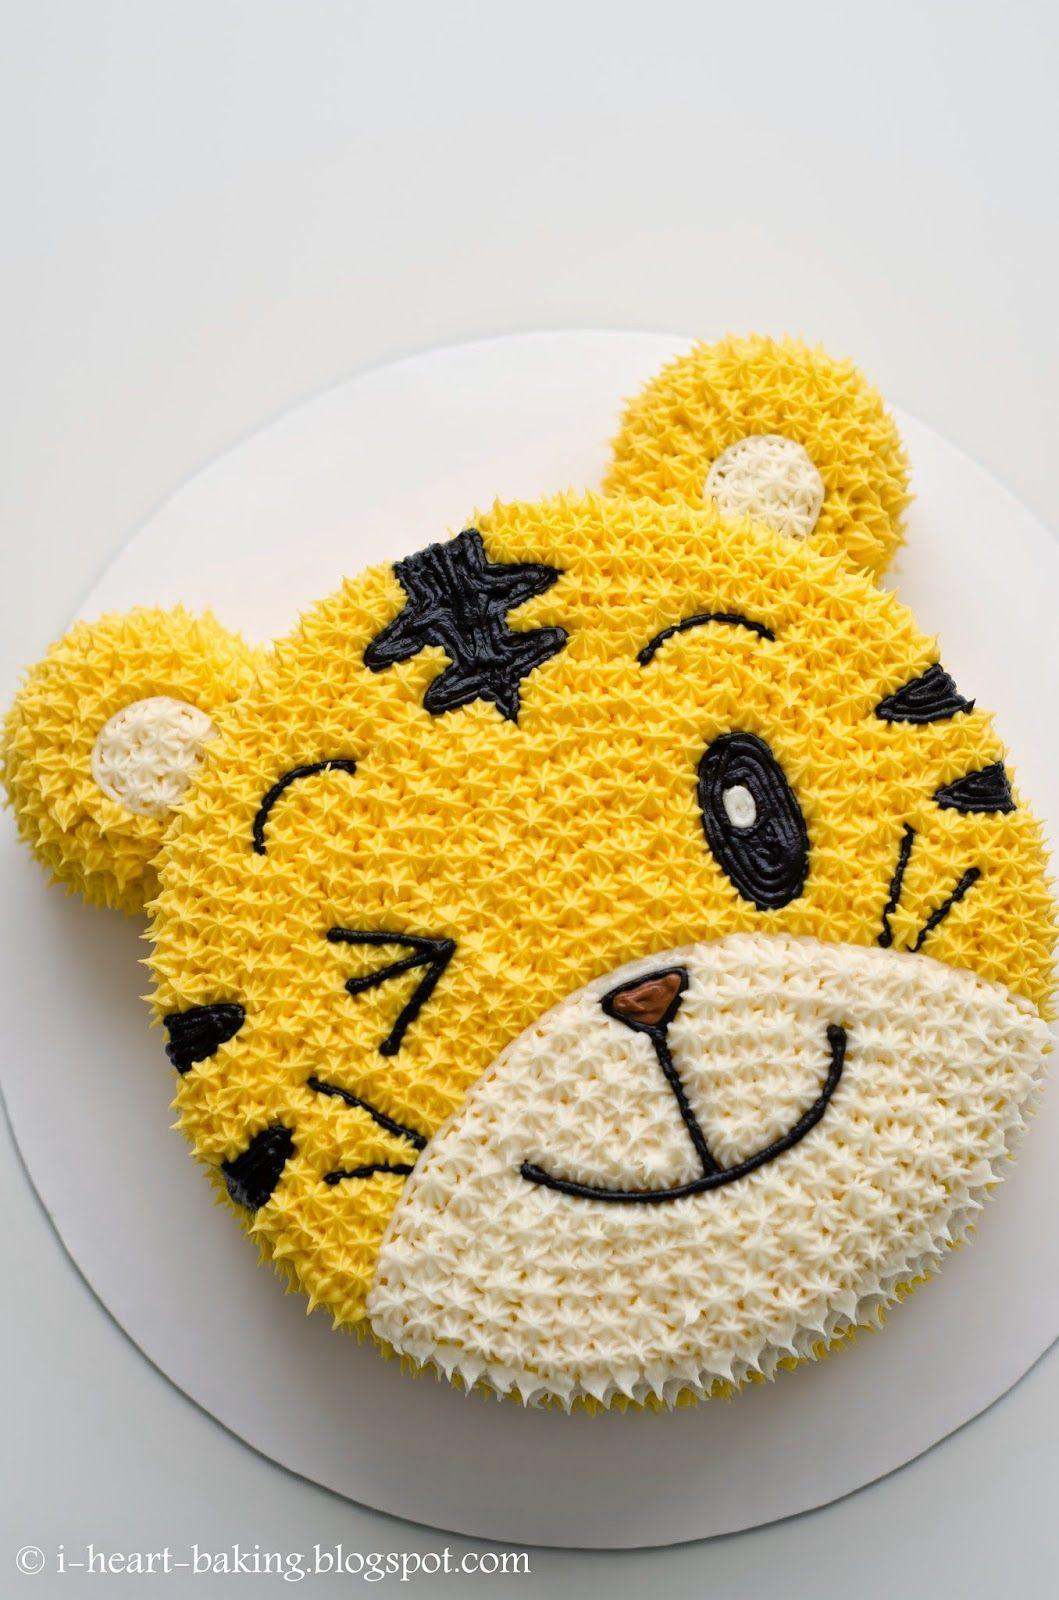 qiaohu tiger cake in 2020 Cartoon cake, Tiger cake, Cake